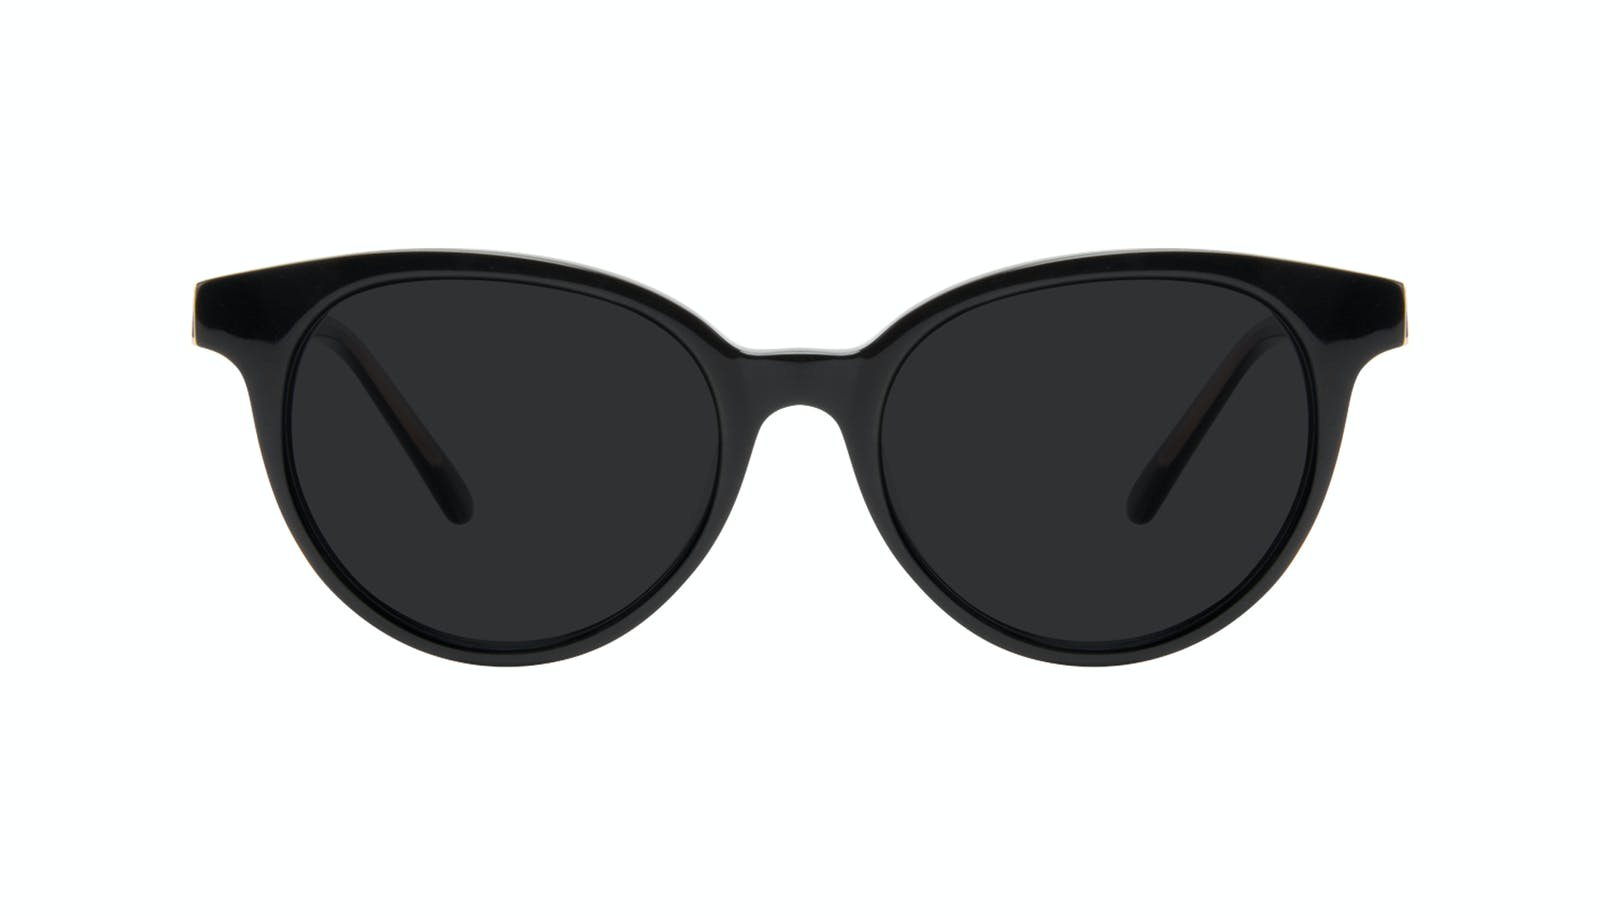 3692aec3259 Affordable Fashion Glasses Round Sunglasses Women Bright Black